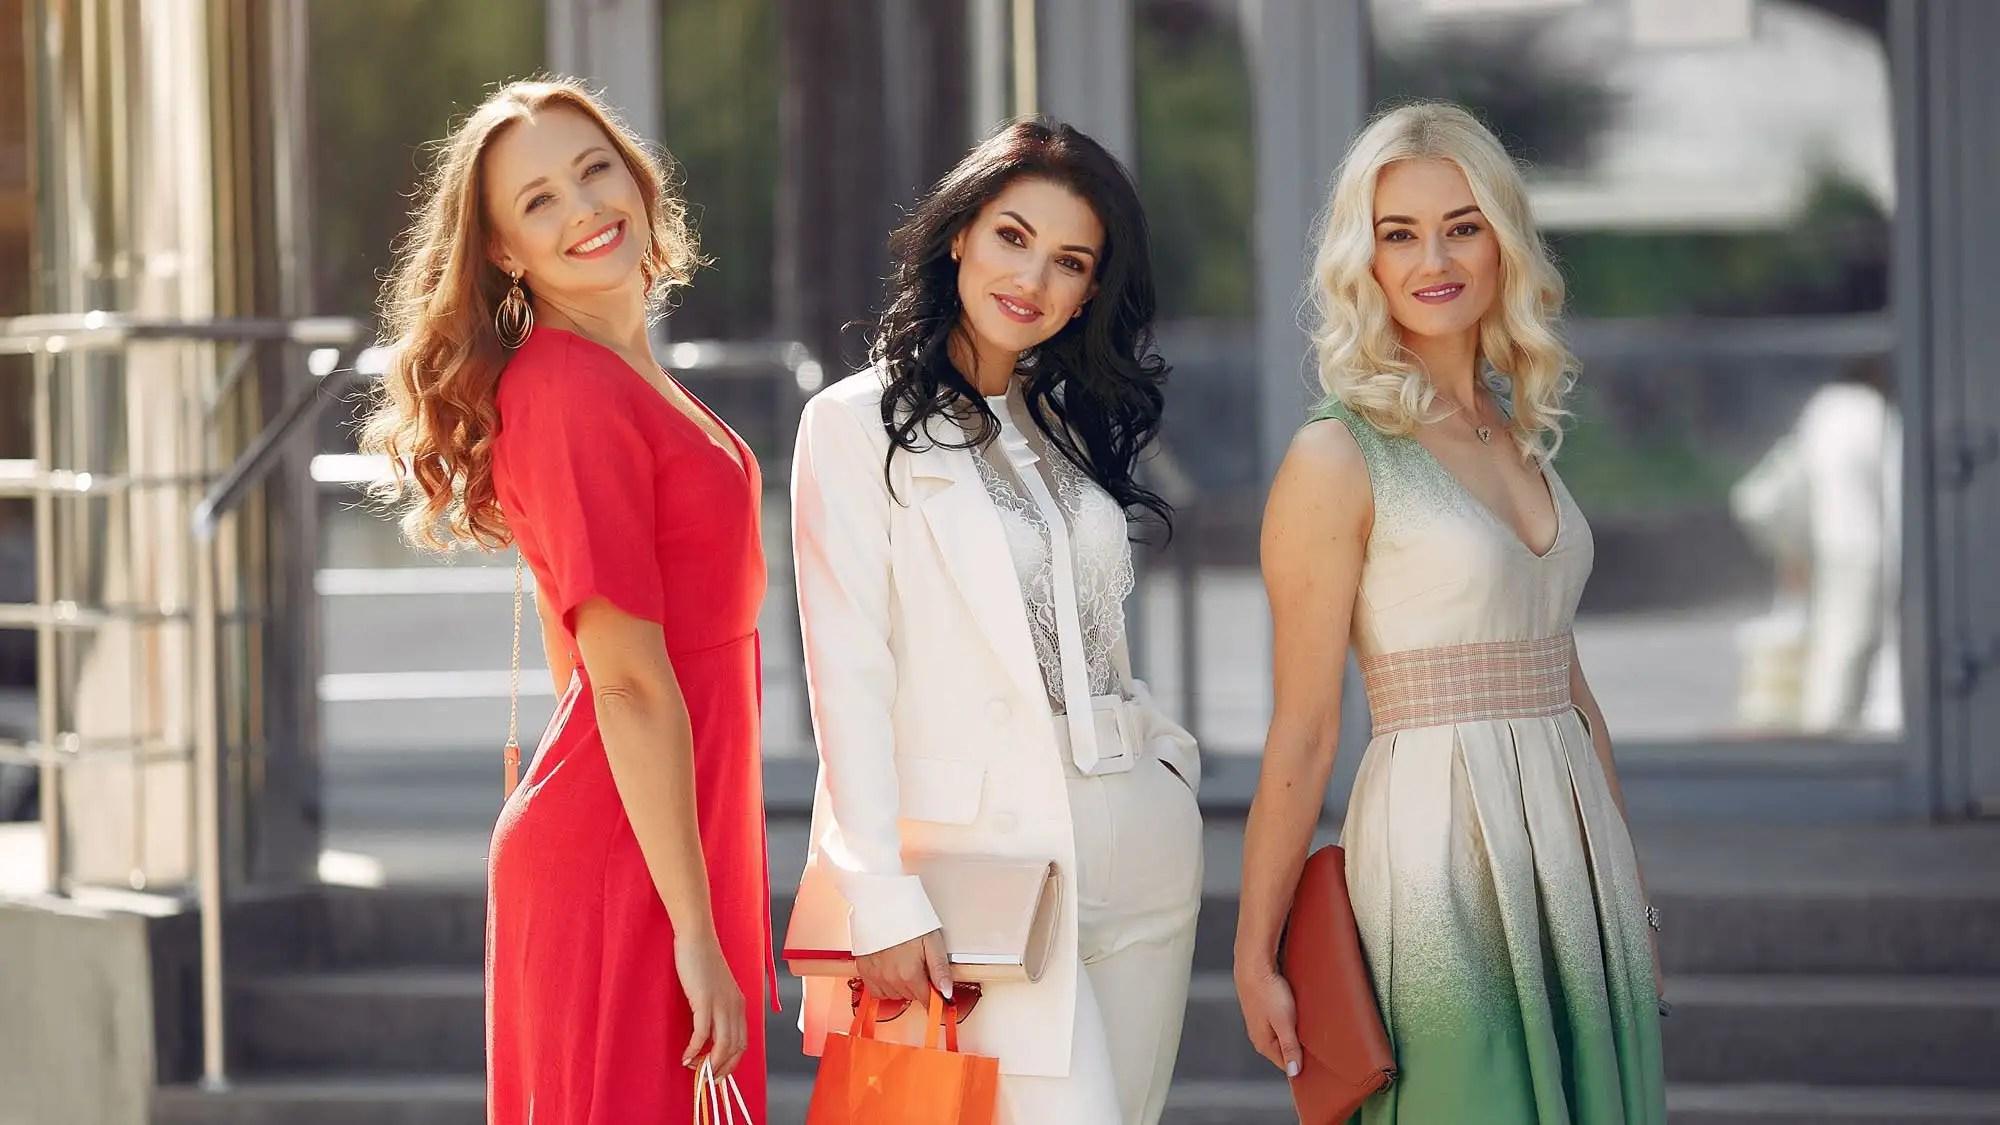 Women shopping. Three elegant woman in a city. Ladies in a stylish dress